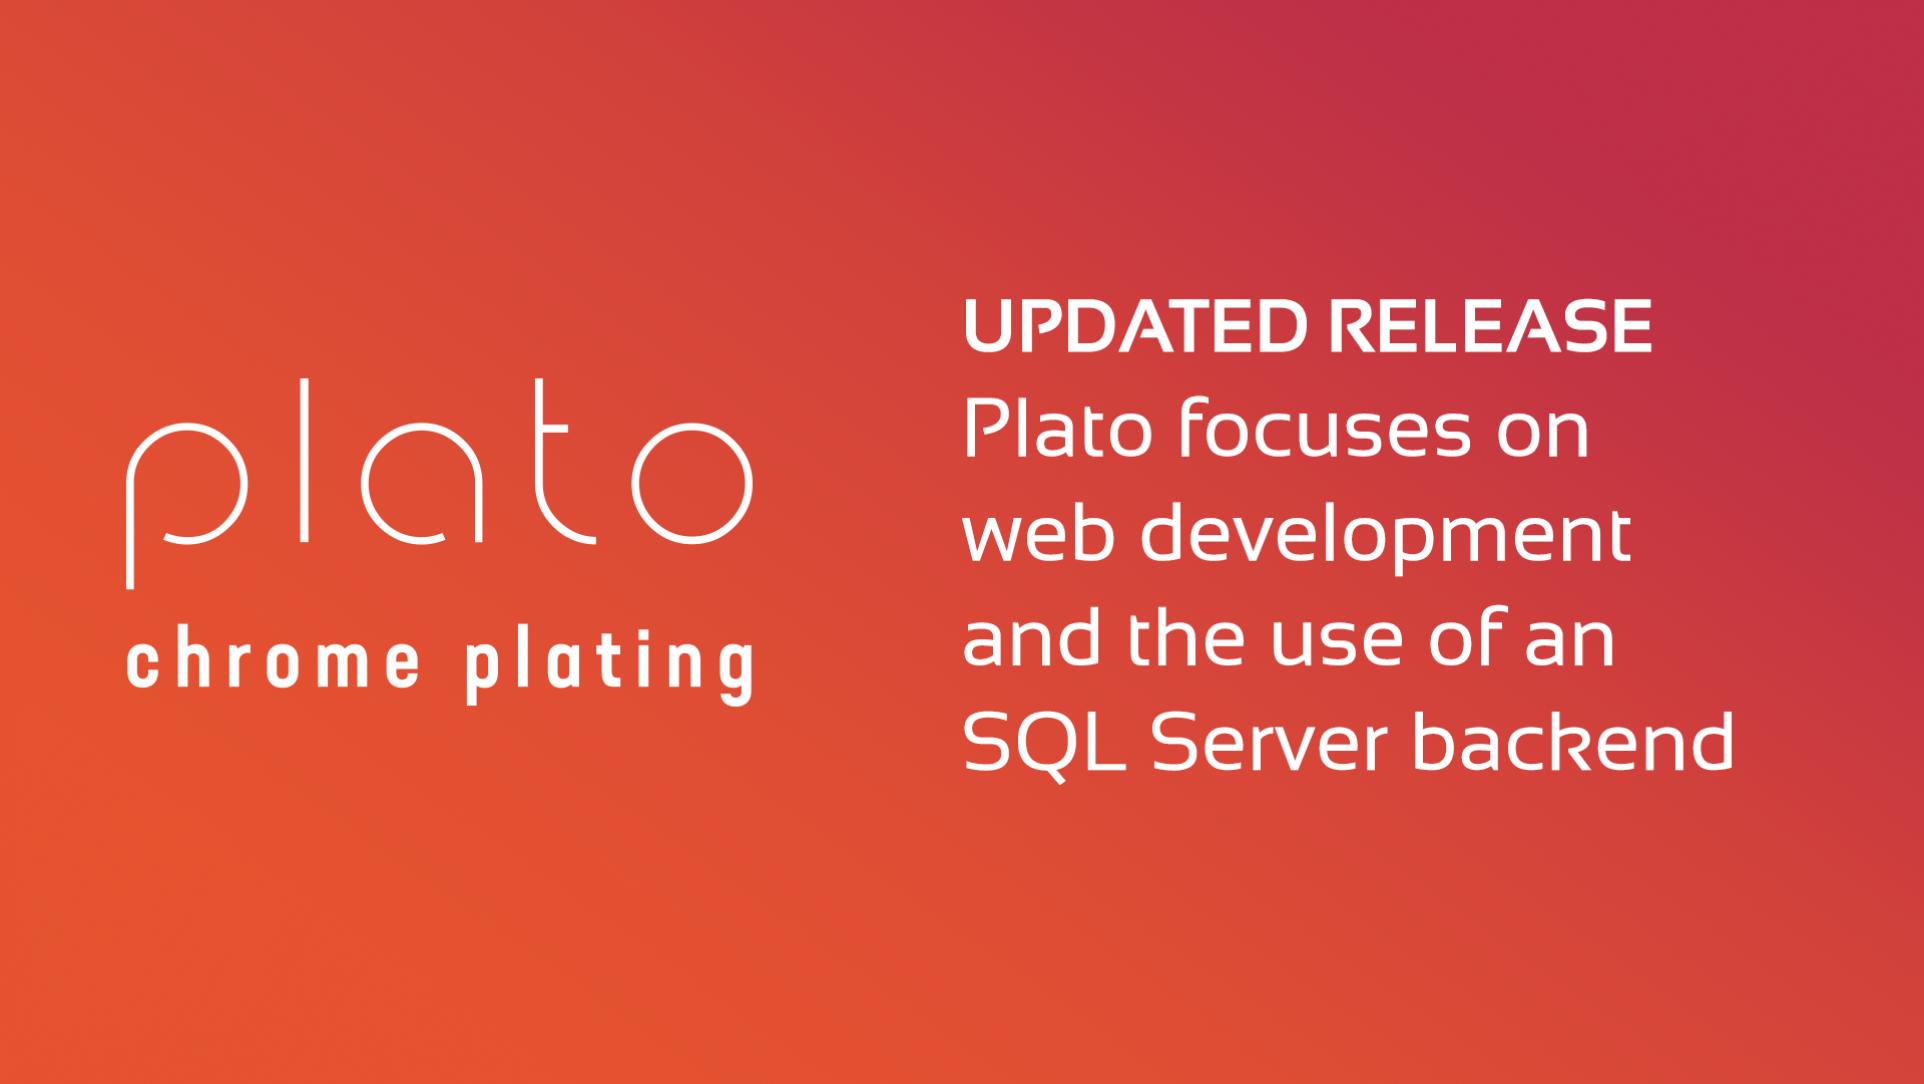 Plato Sample DataFlex App Update Released